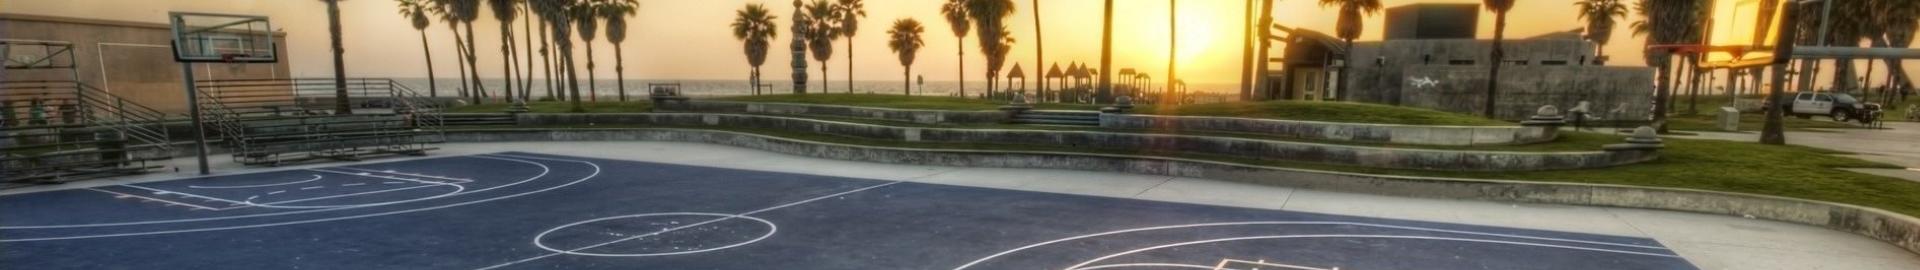 Scarpe Jordan da Basket Uomo/Donna/Bambino | Basket Zone Siena